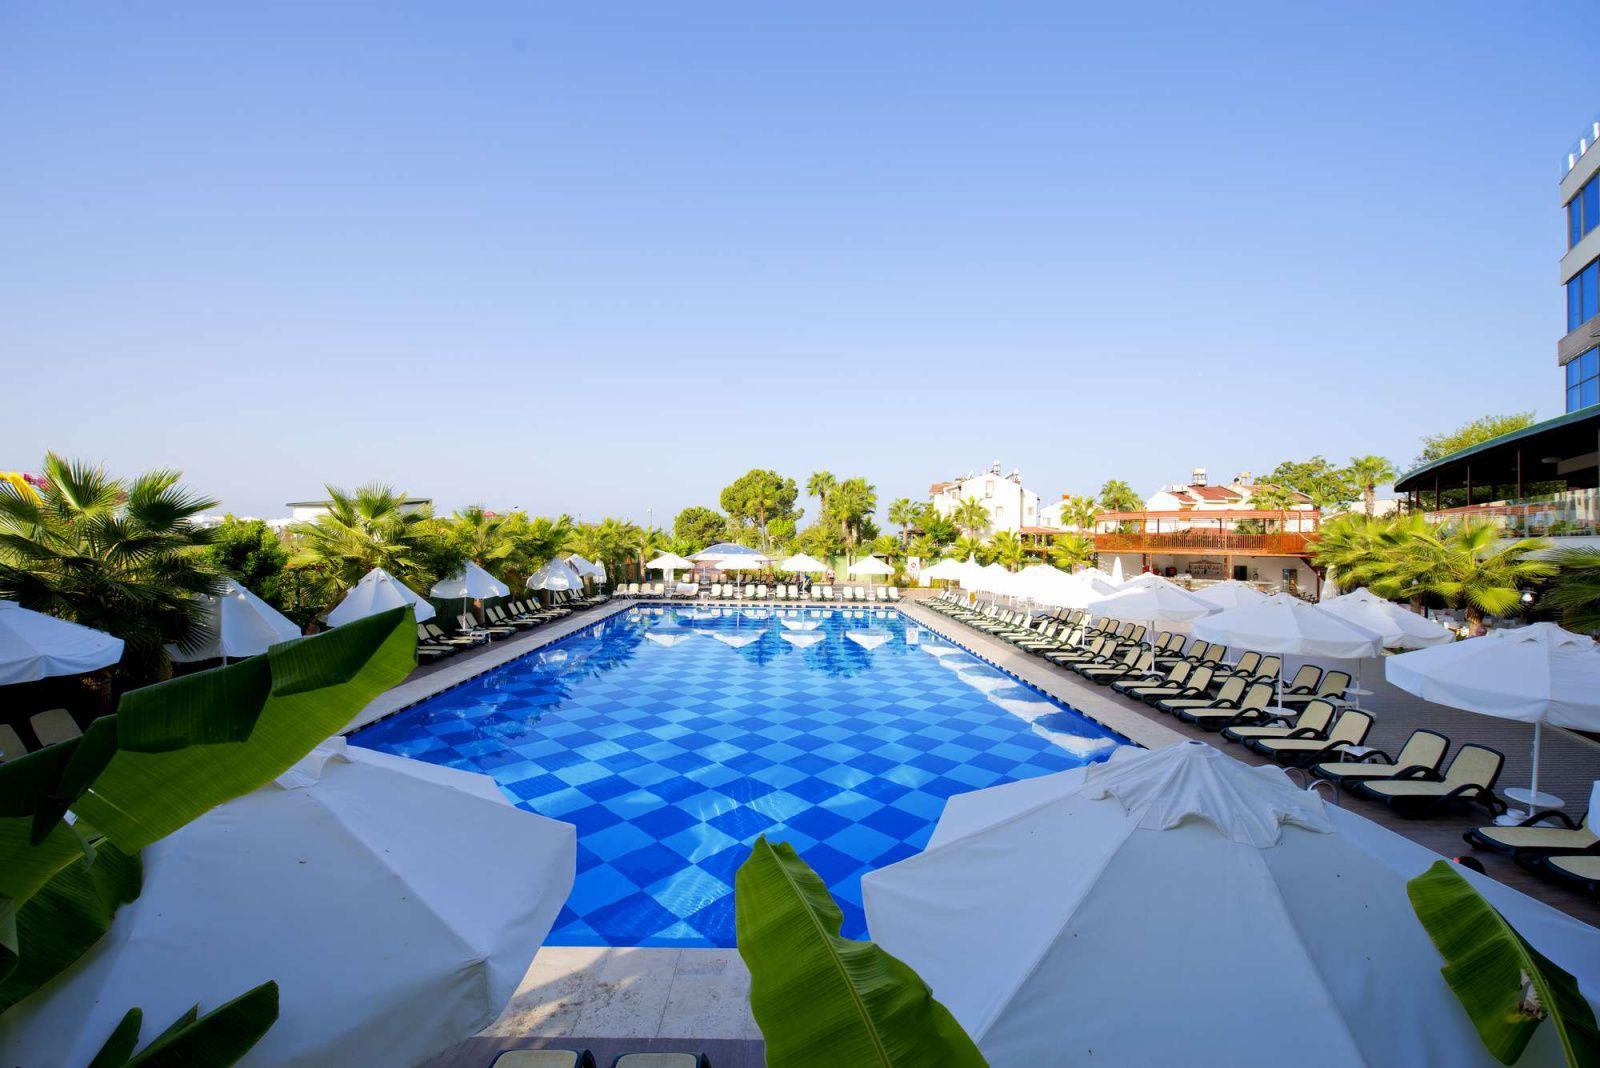 raymar-resort-aqua-5